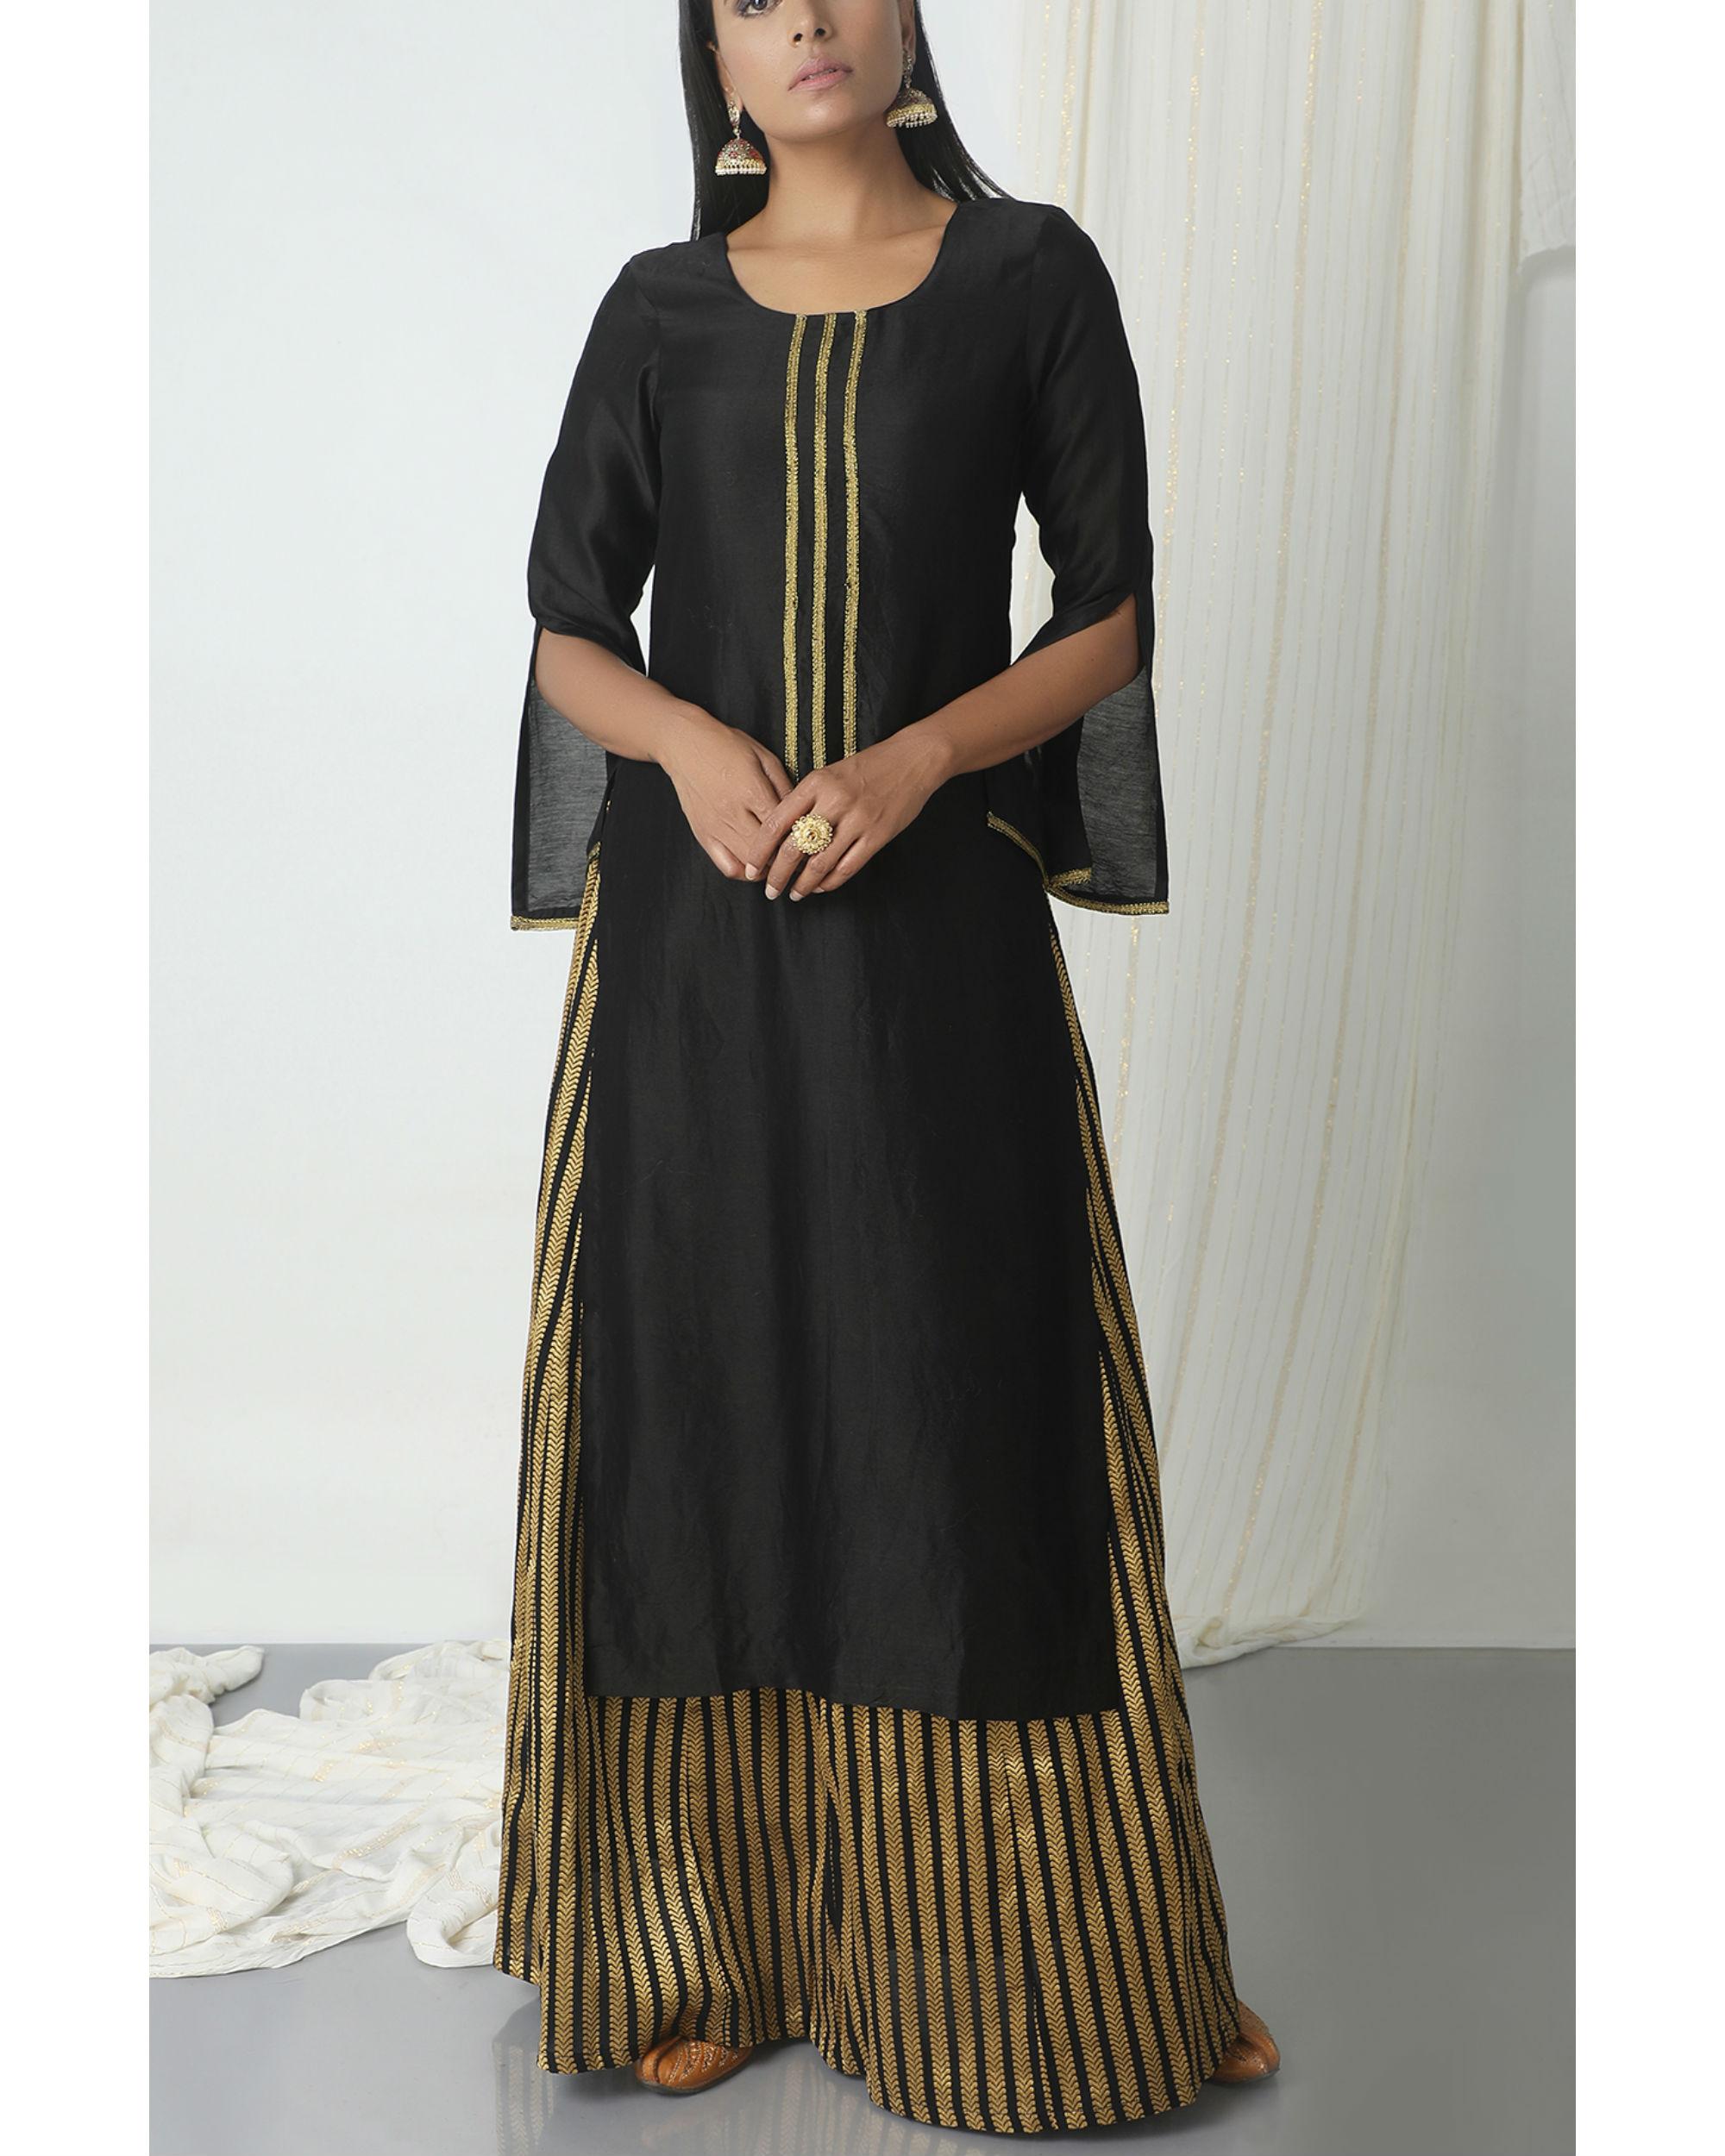 Gold and black skirt kurta set